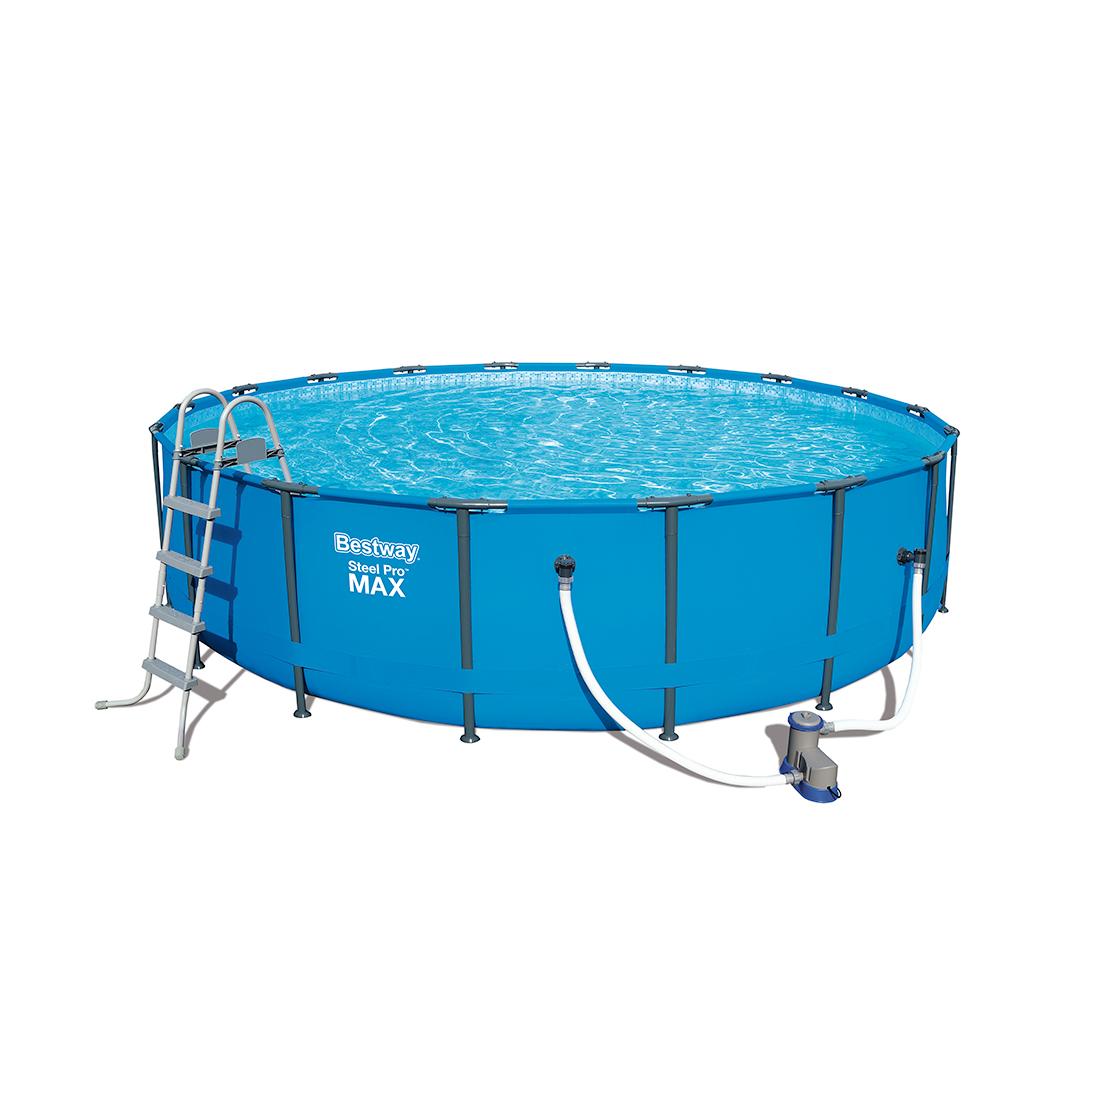 Каркасный бассейн Bestway 56462 (56113)